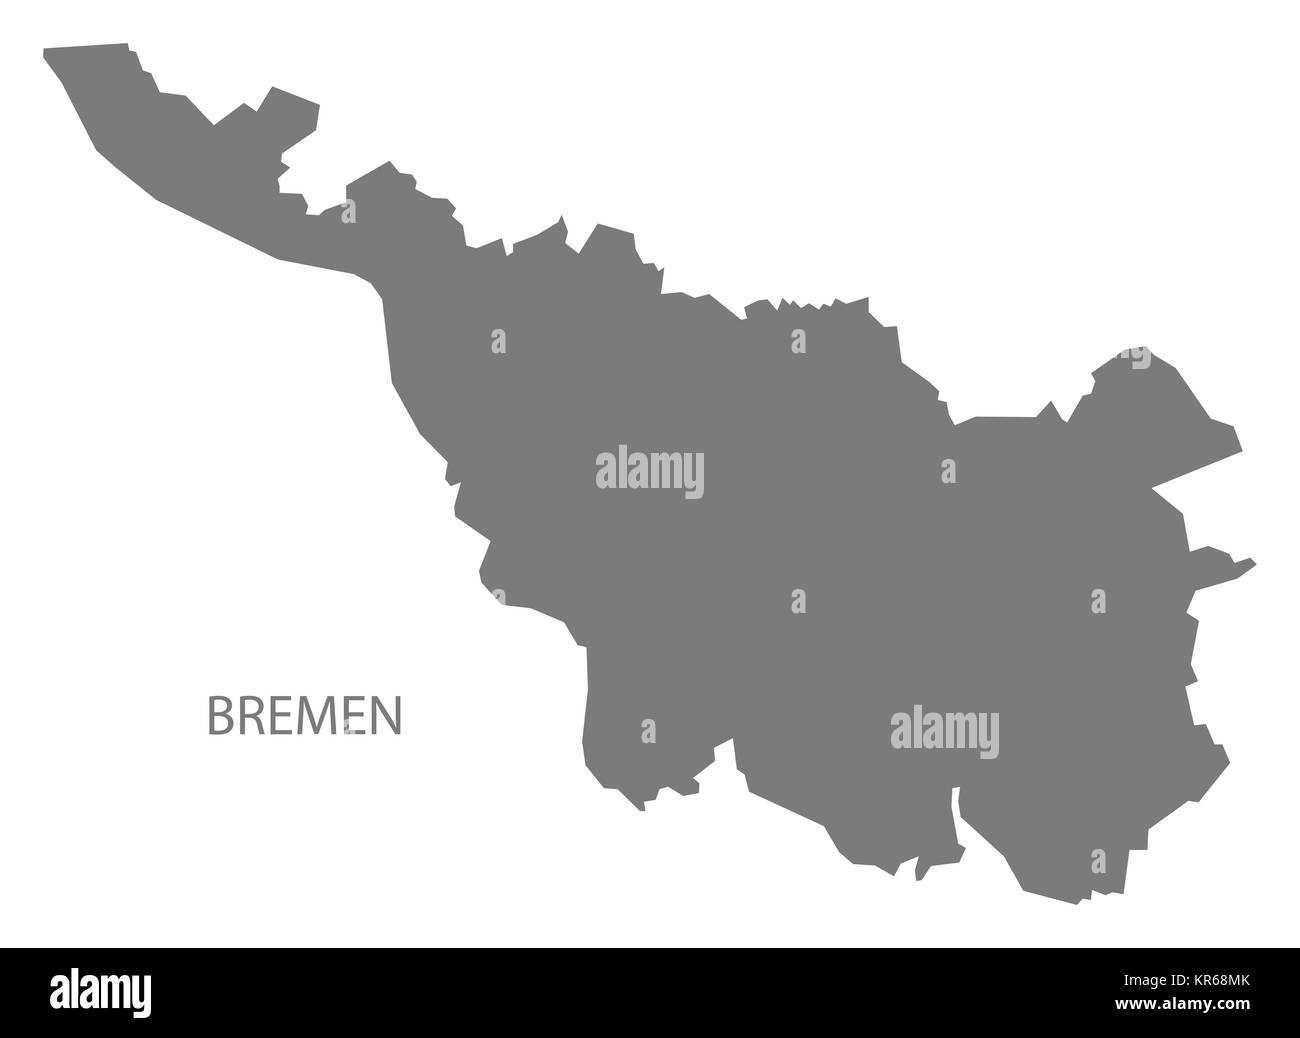 bremen germany map grey